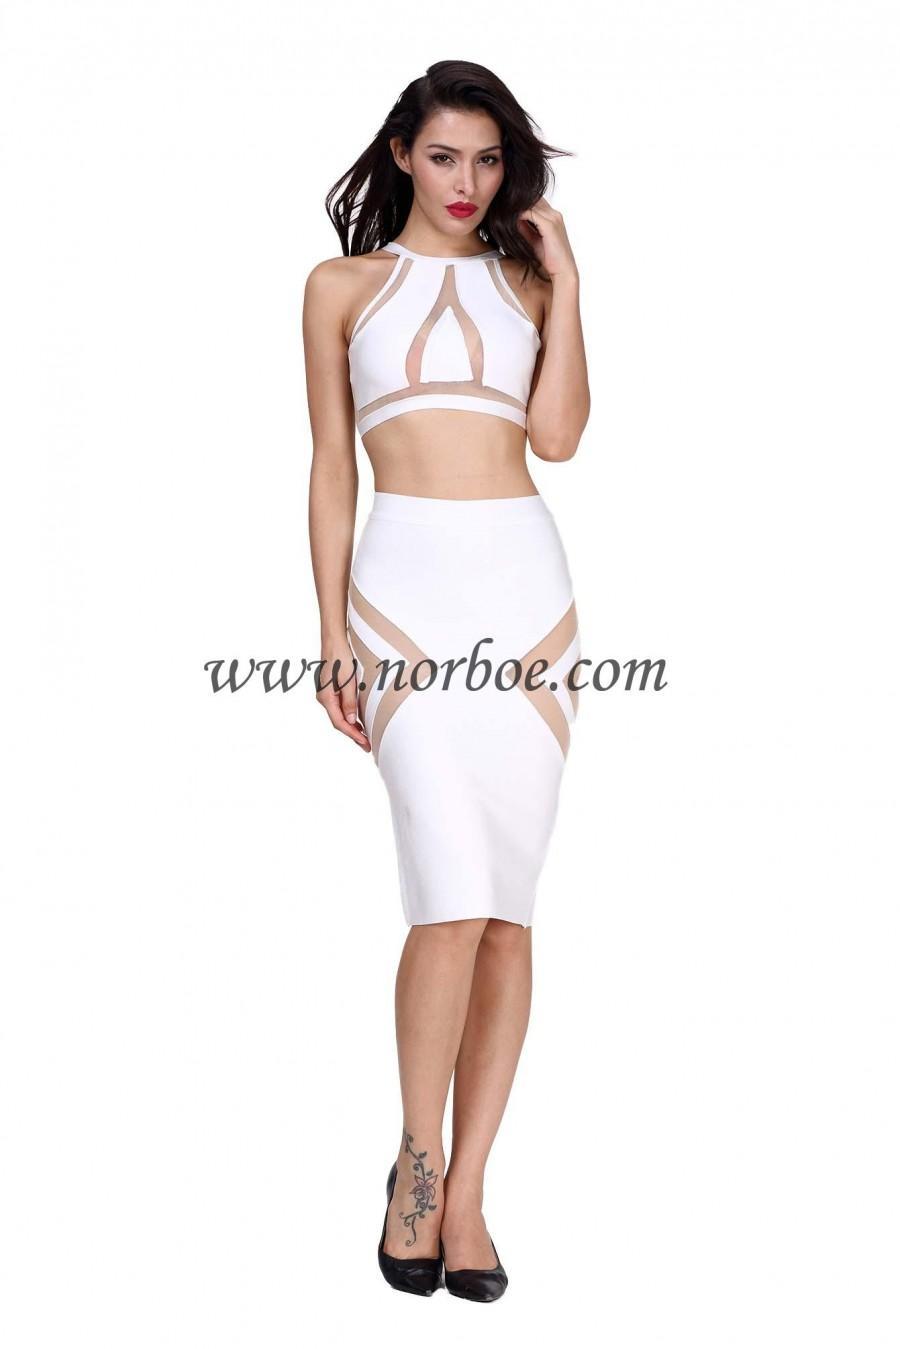 Norboe Bodycon Bandage Dress-White #2208914 - Weddbook